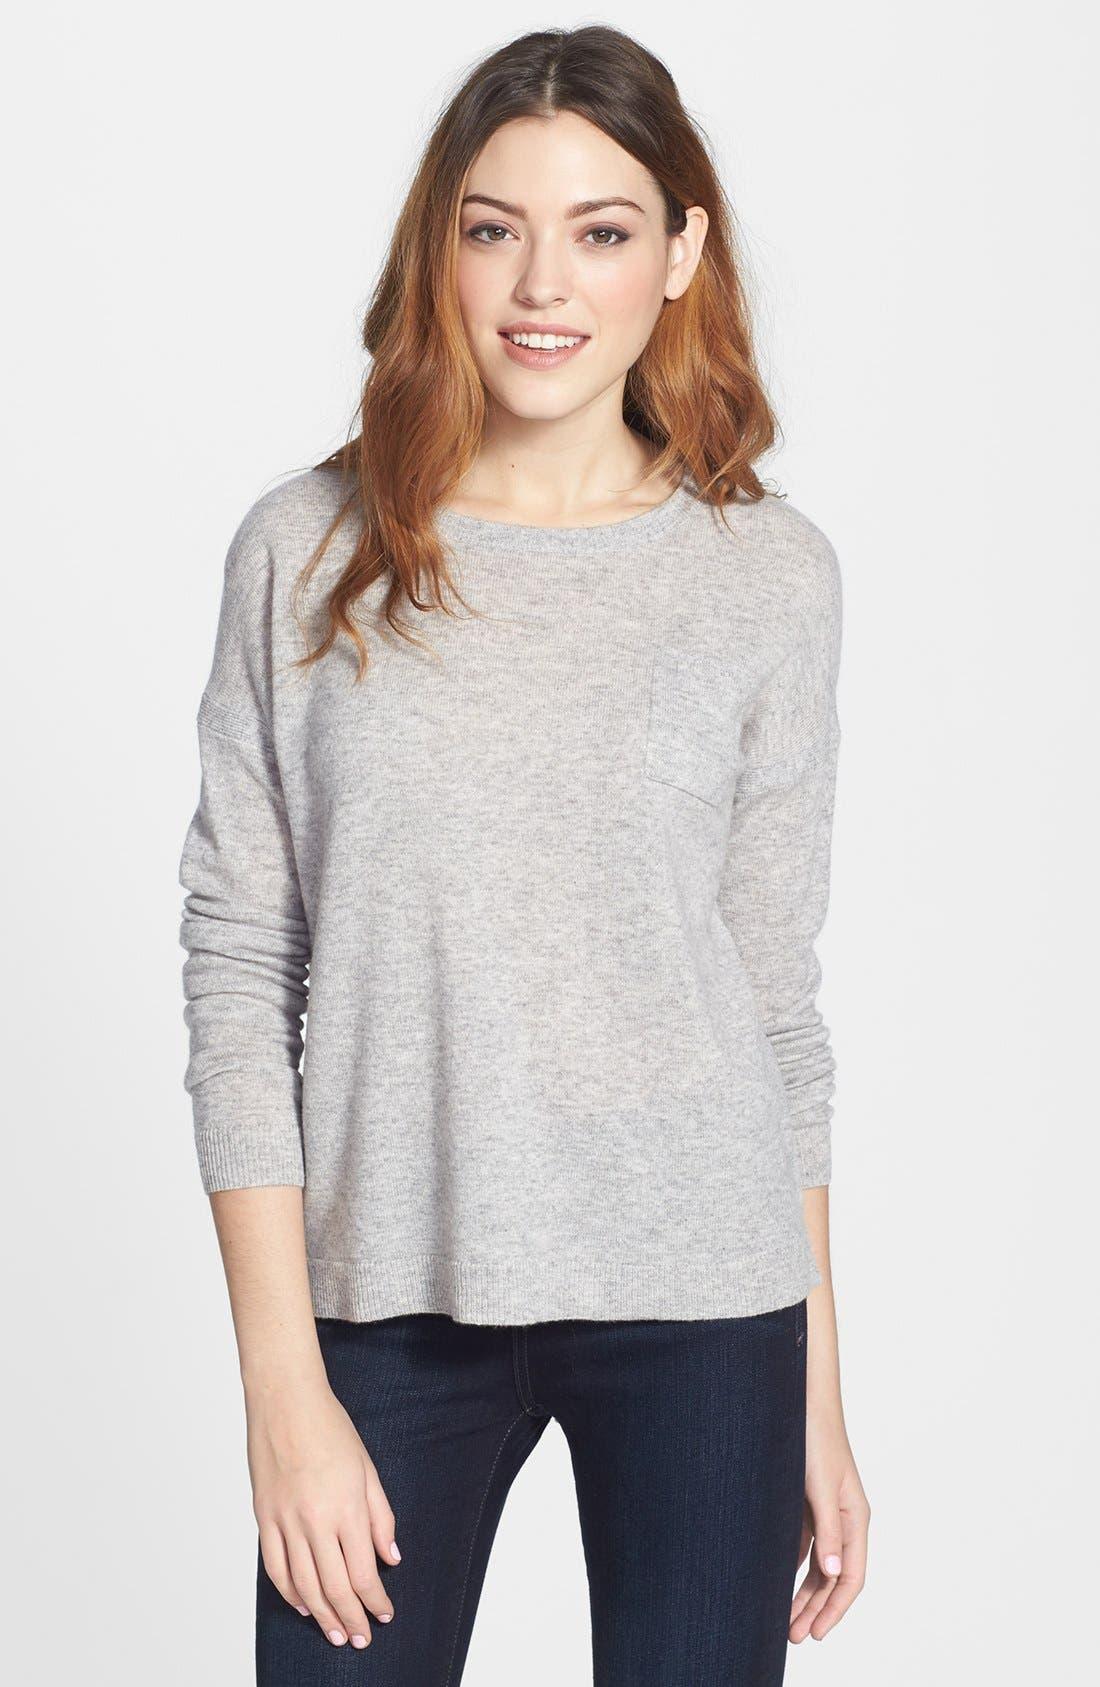 Alternate Image 1 Selected - Halogen® Lightweight Cashmere Crewneck Sweater with Pocket (Petite)